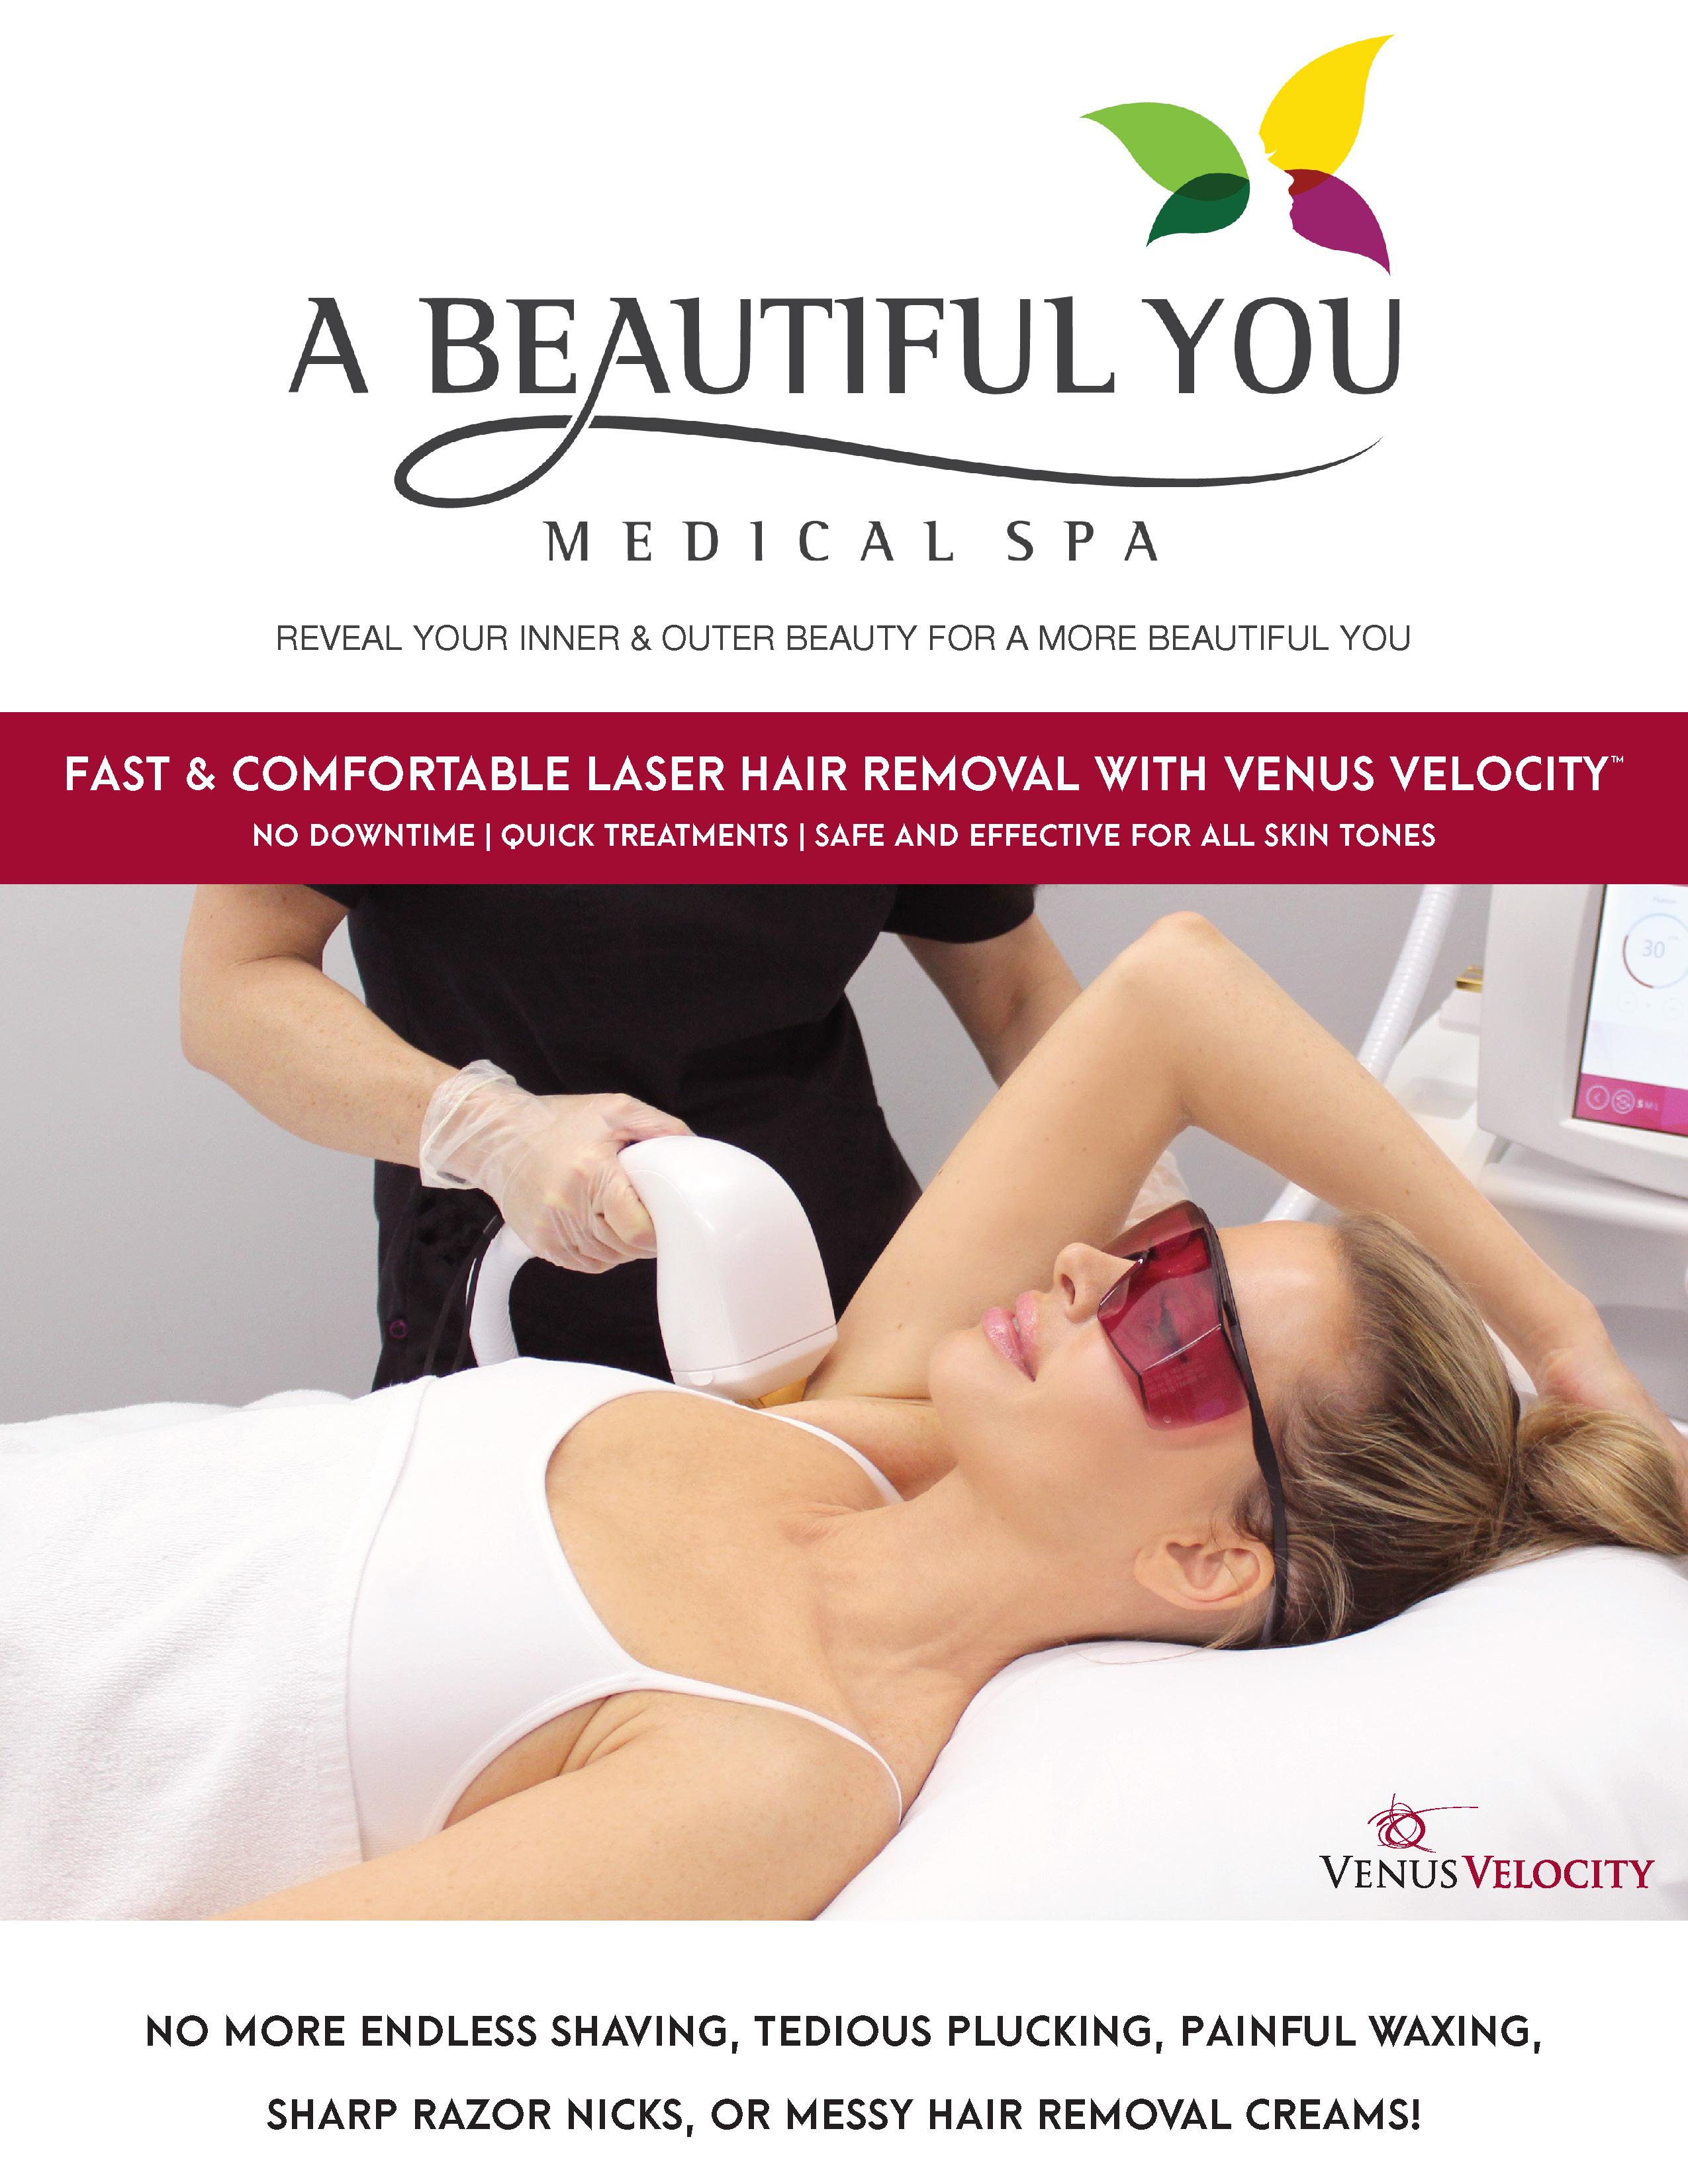 A Beautiful You Medical Spa image 11